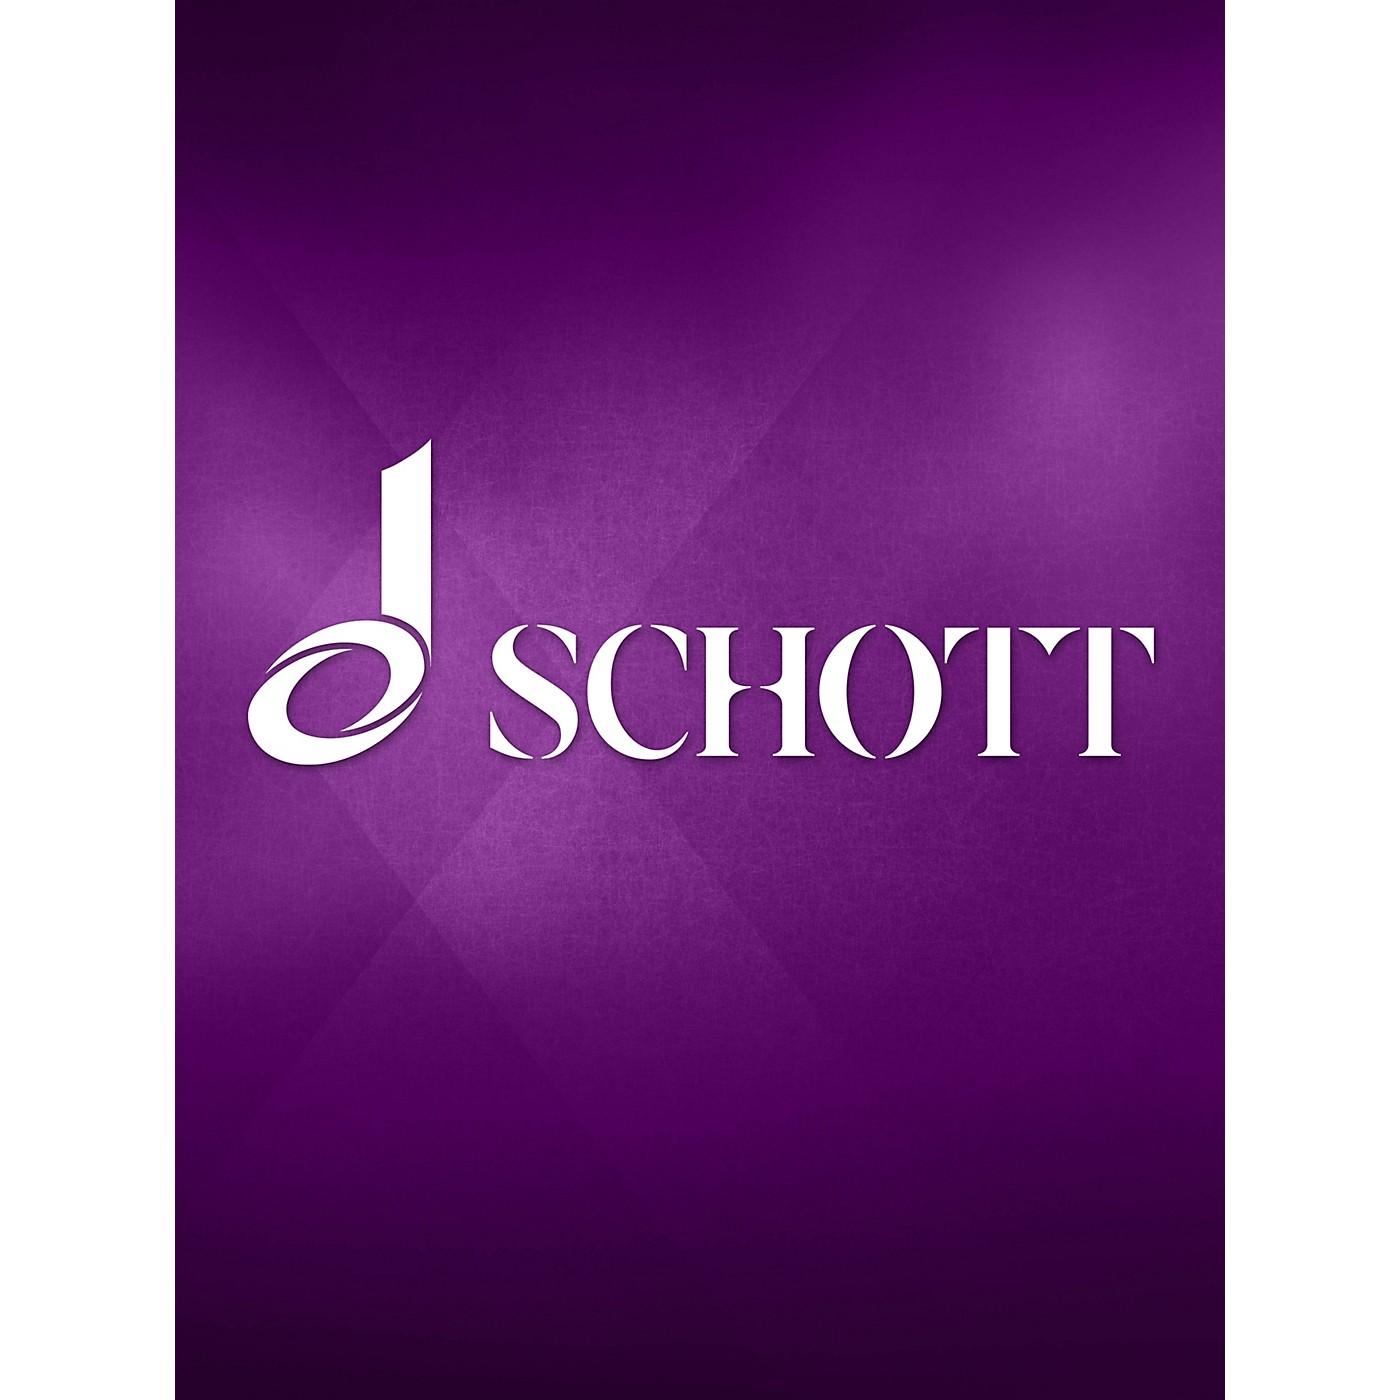 Schott Dr. Straight & Mr. Swing (for Piano) Schott Series thumbnail